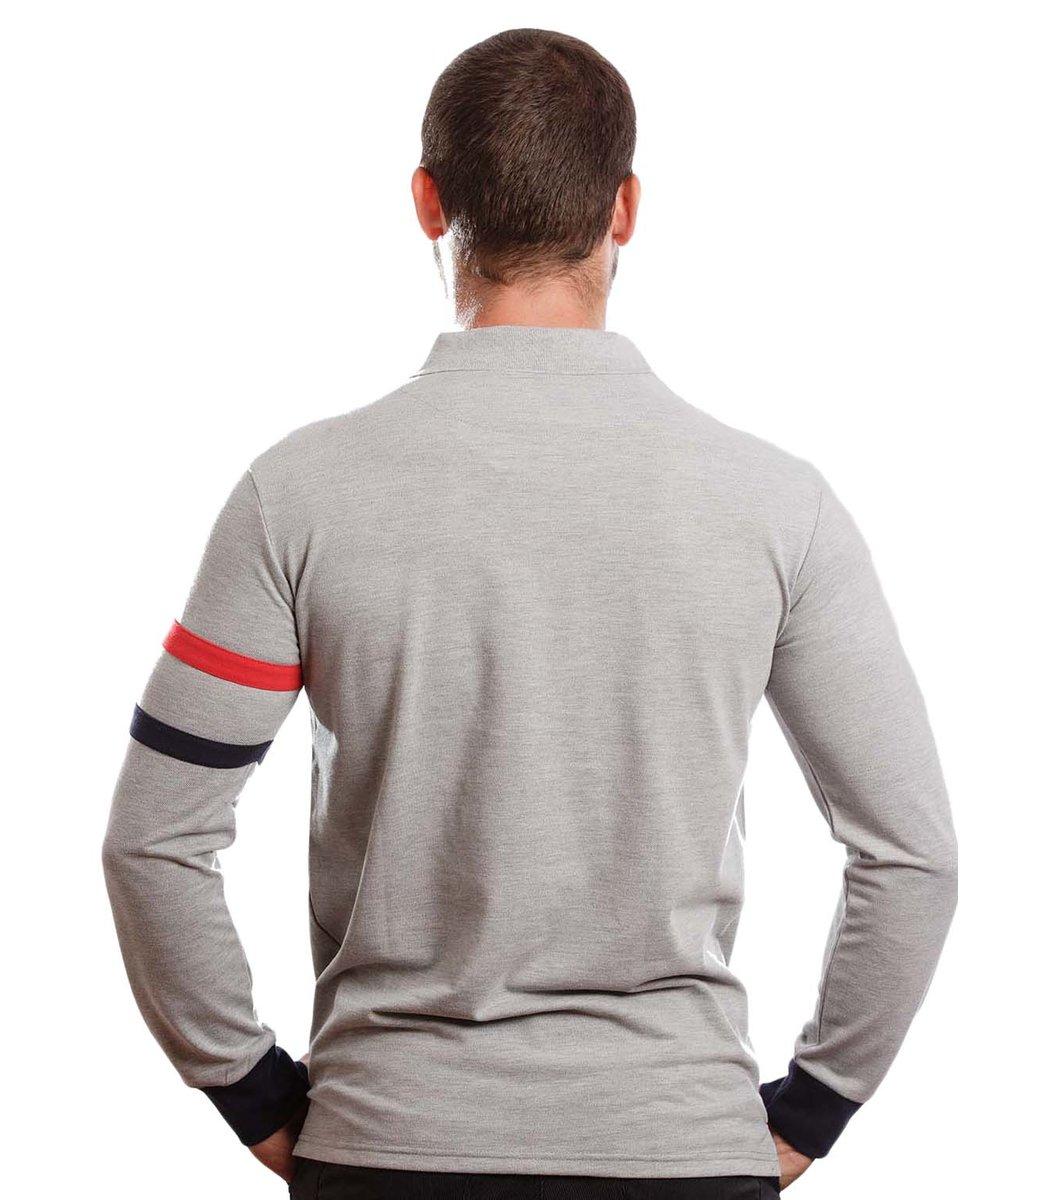 Поло с длинным рукавом Hackett PH1 (Серый) - Серый - Вид 5